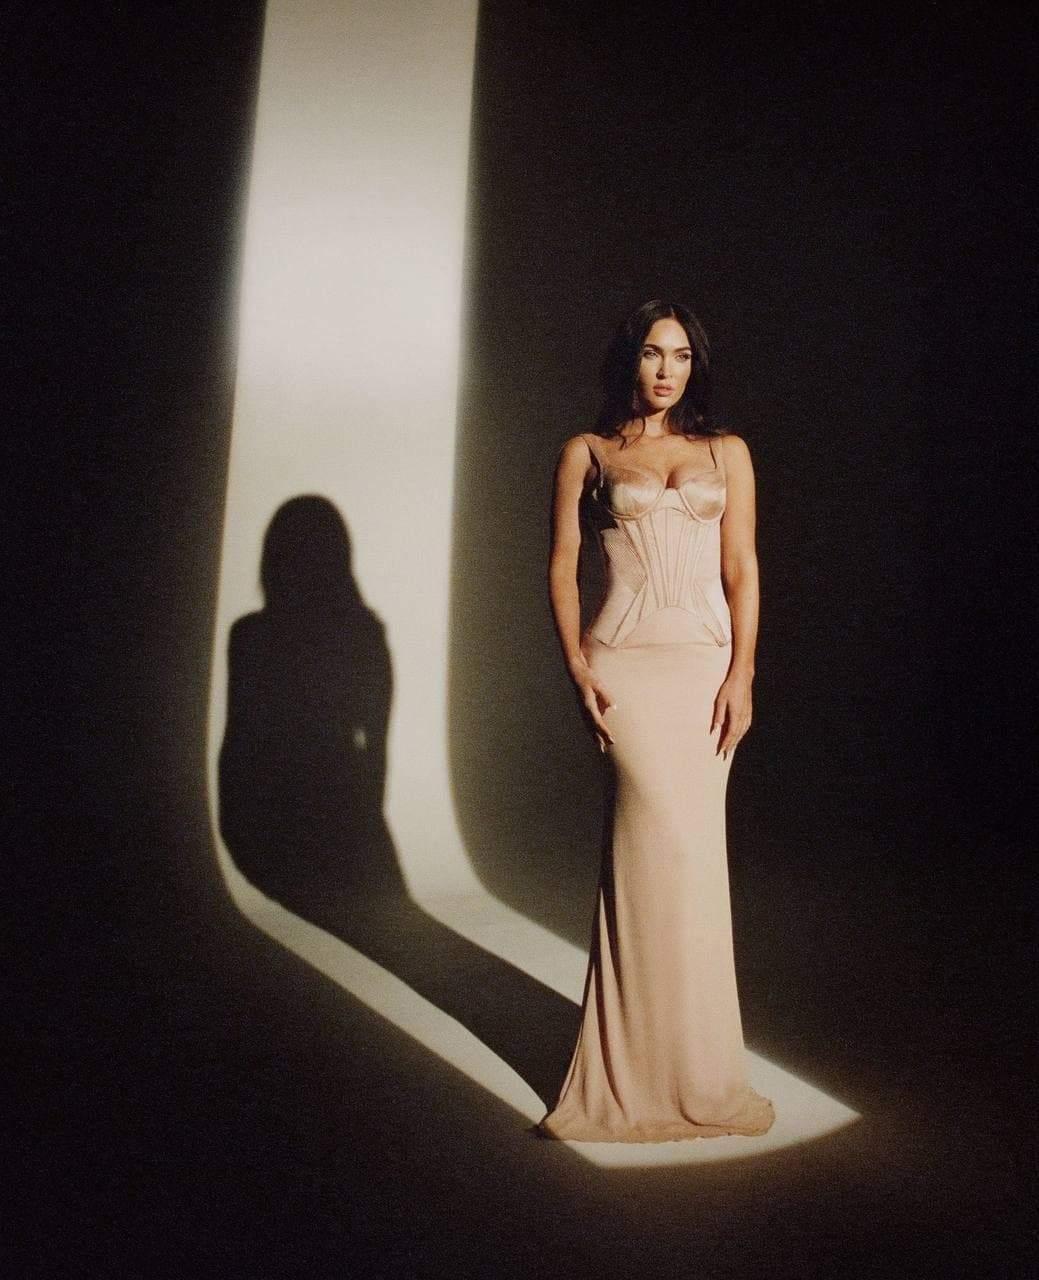 Меган Фокс знялася у фотосесії для глянцю In Style